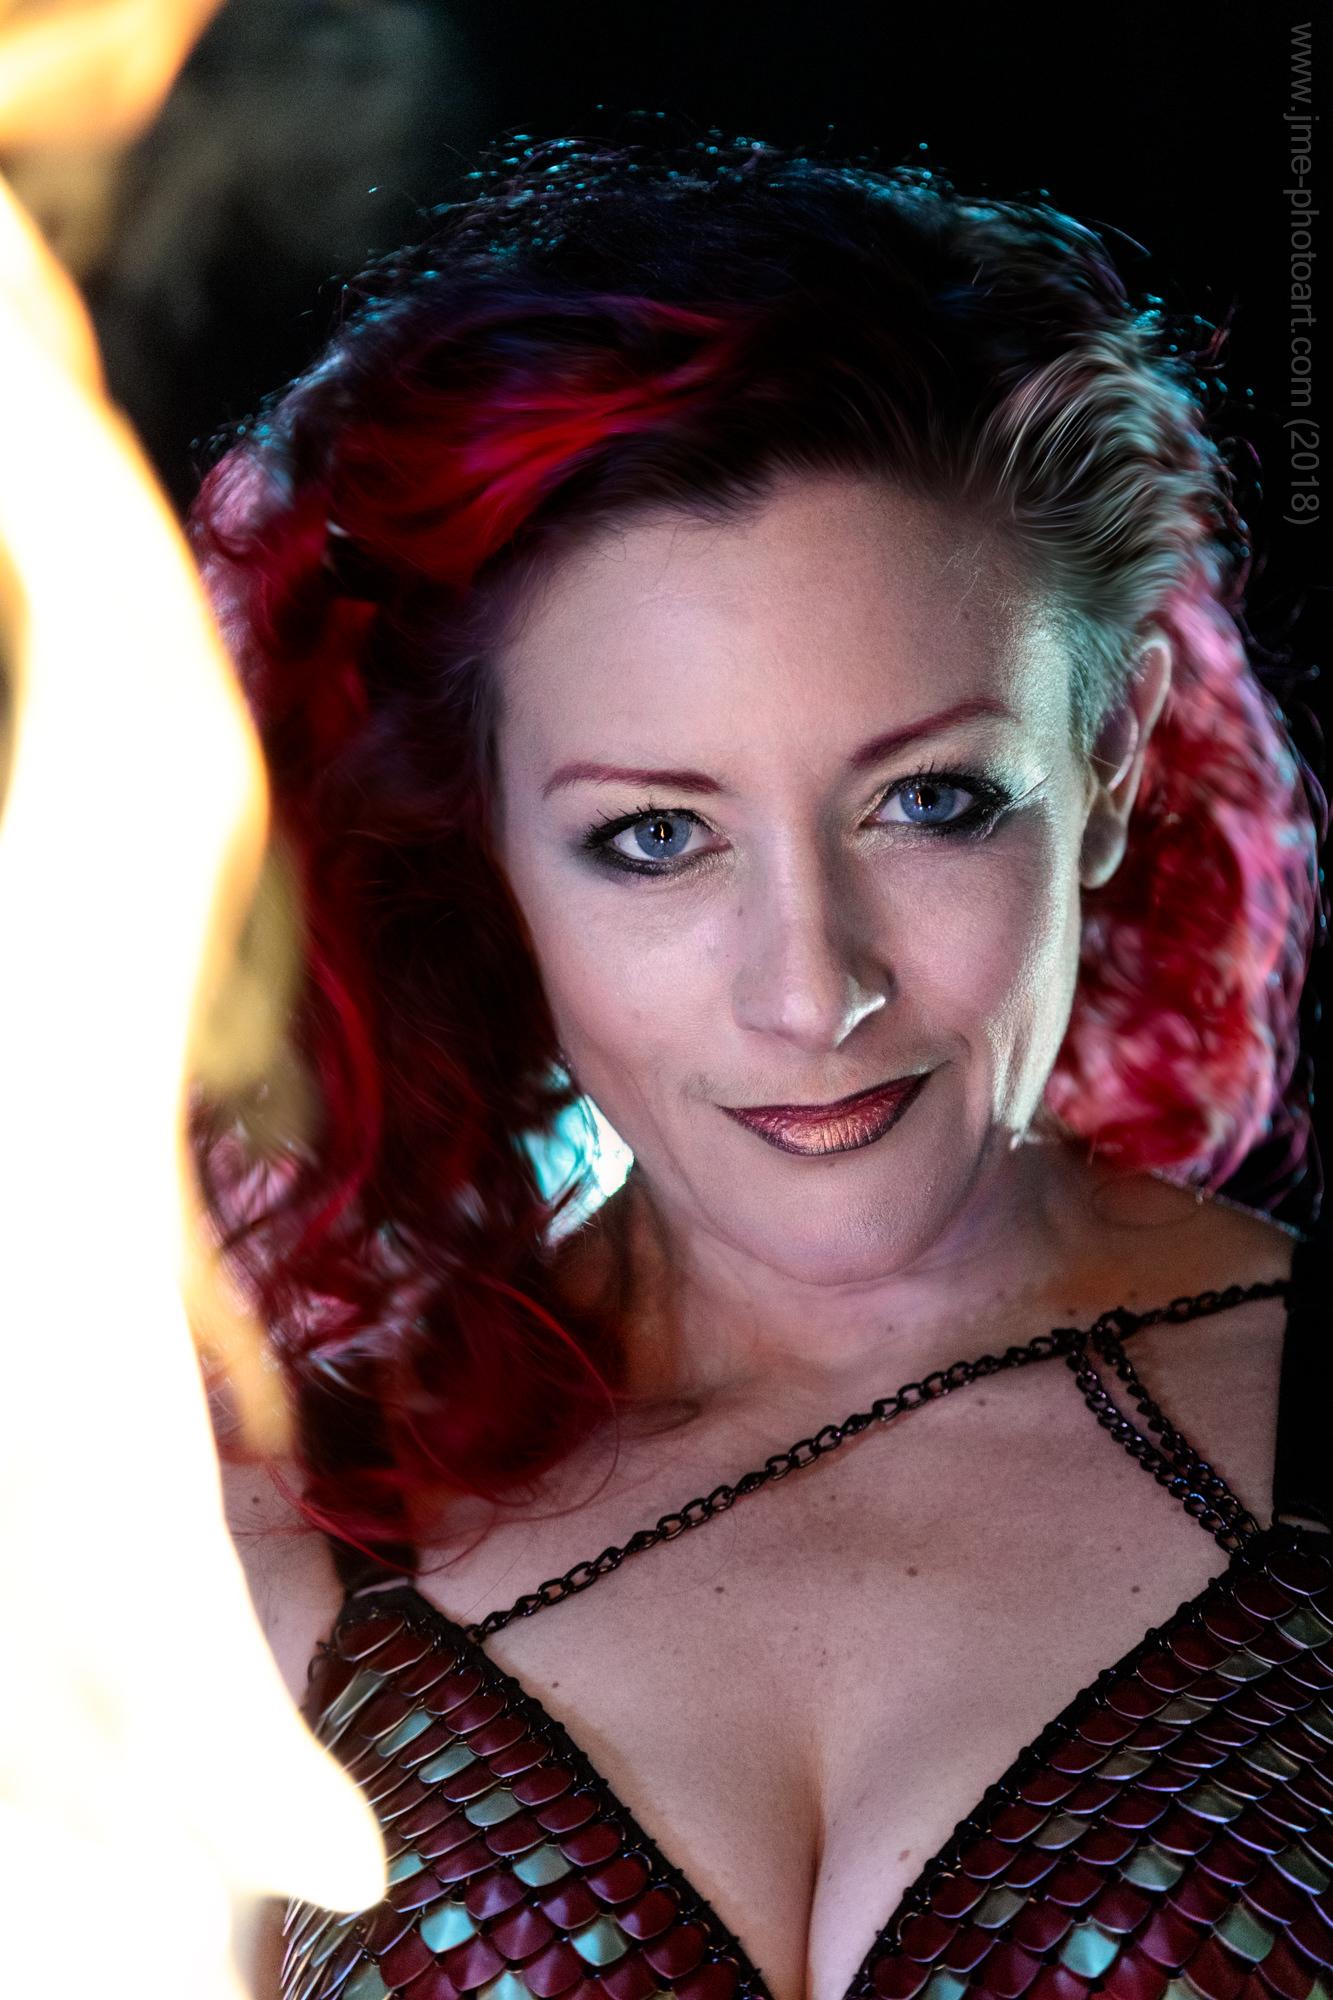 Red Sarah - 028-Edit.jpg